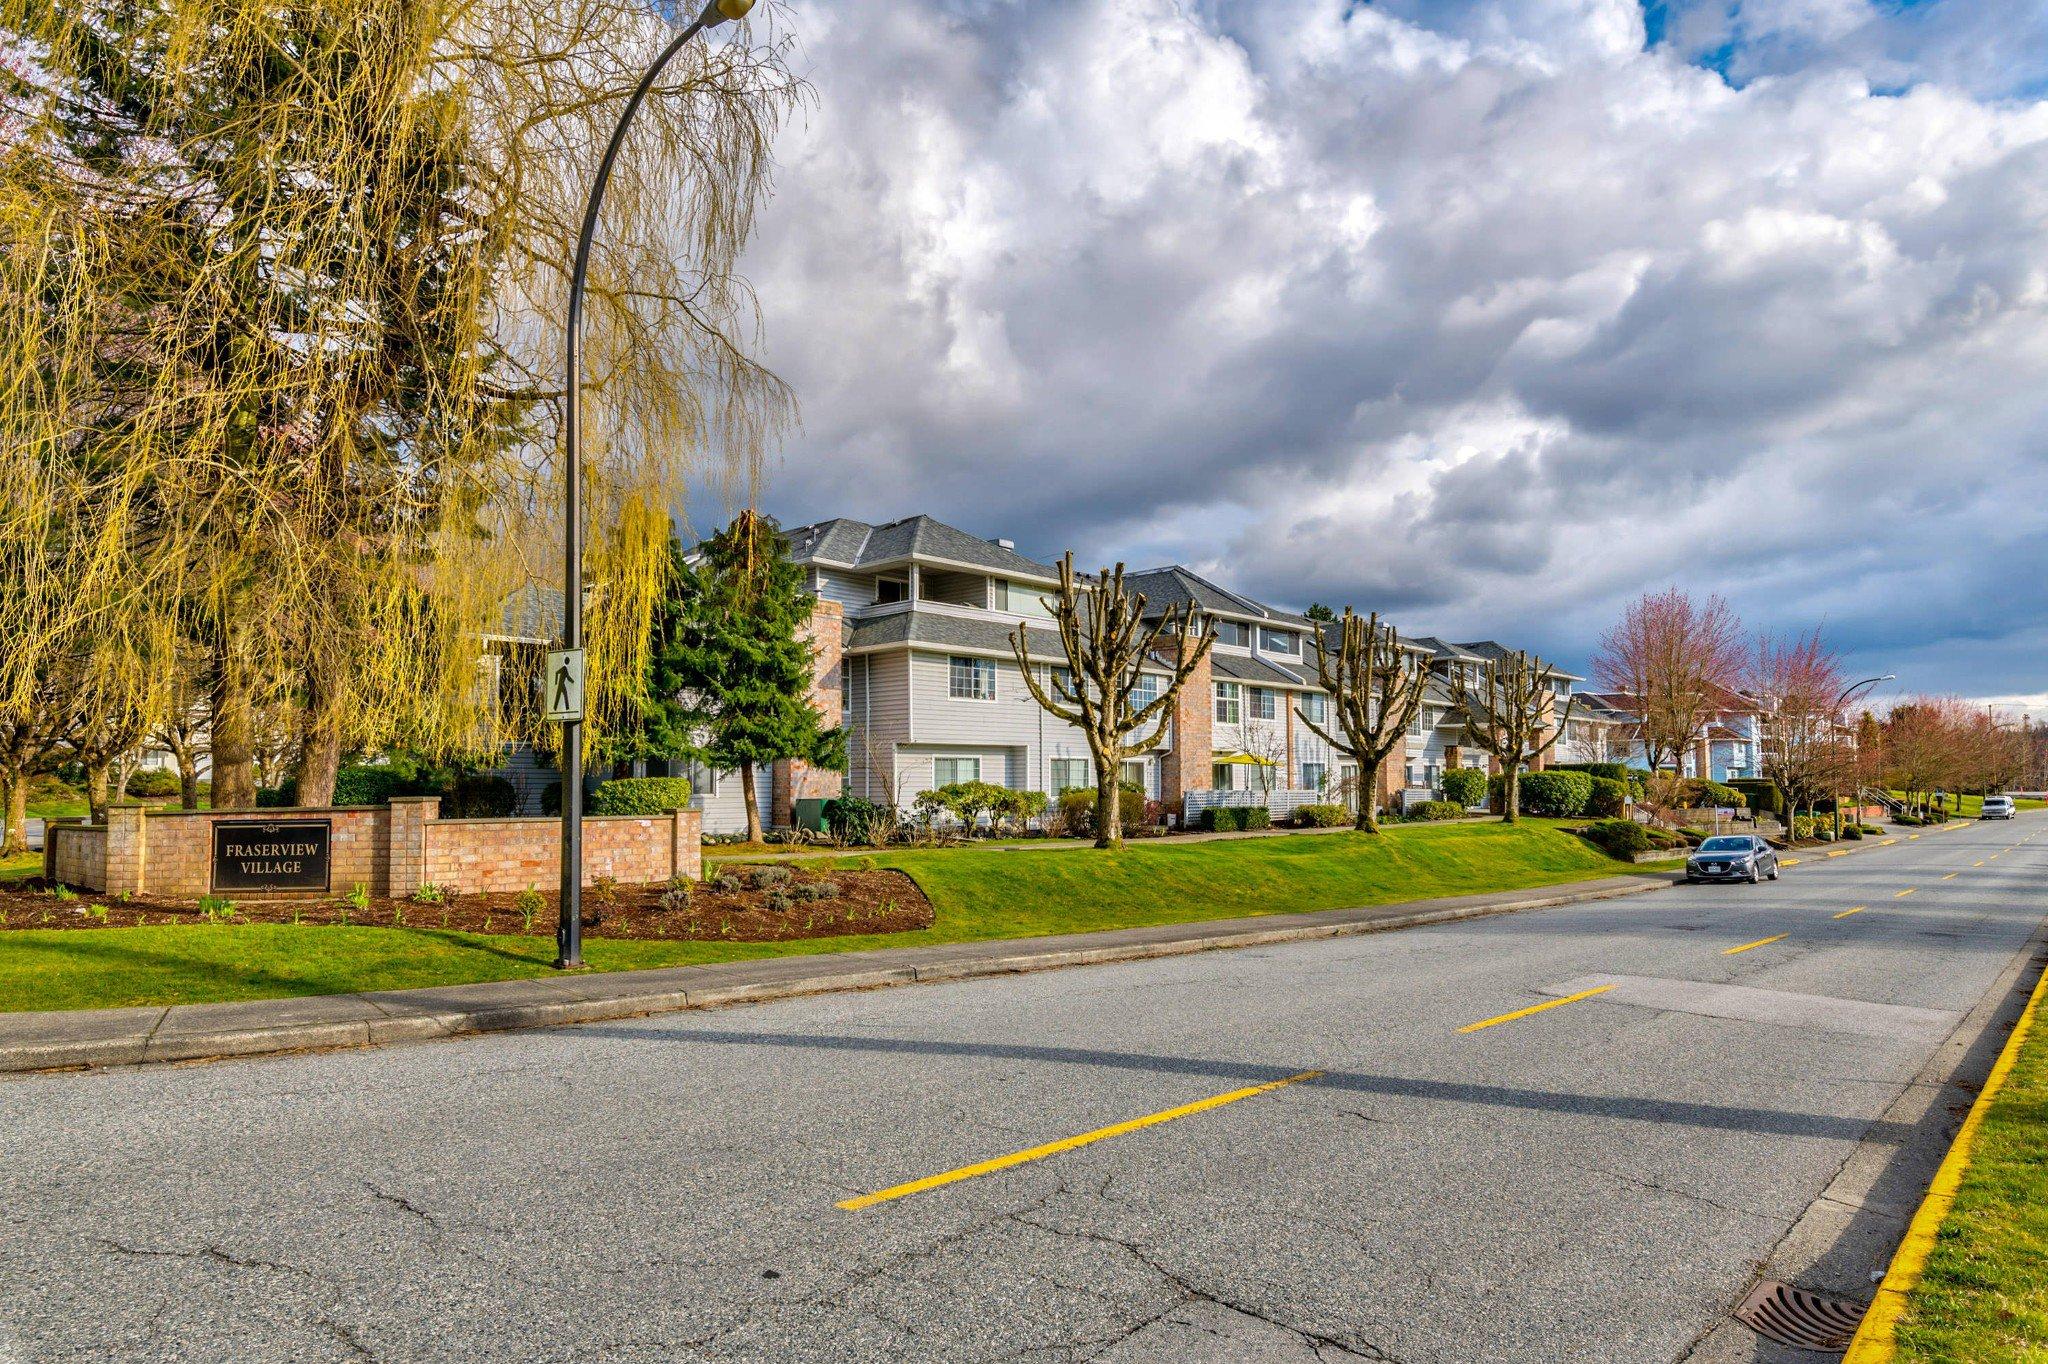 Photo 2: Photos: 203 11578 225 STREET in Maple Ridge: Condo for sale : MLS®# R2447700